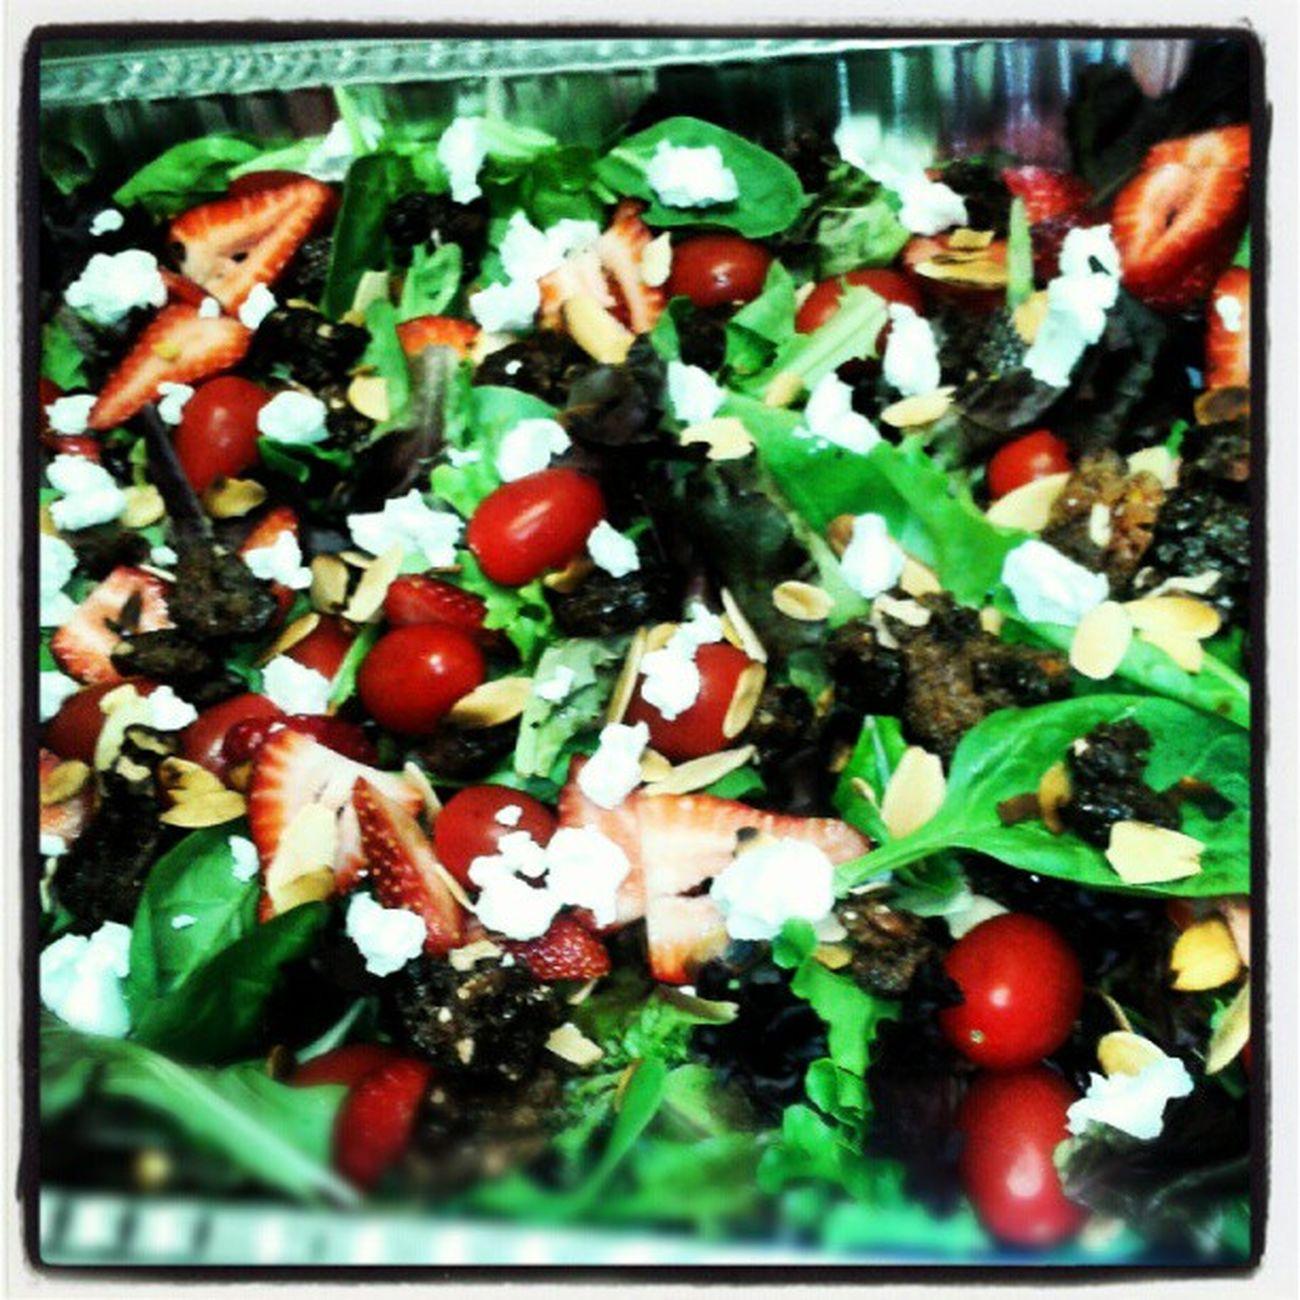 Bushfiregrill Organic Mixedgreens Strawberries cherrytomatoes toastedalmonds candiedwalnuts goatcheese driedcranberries